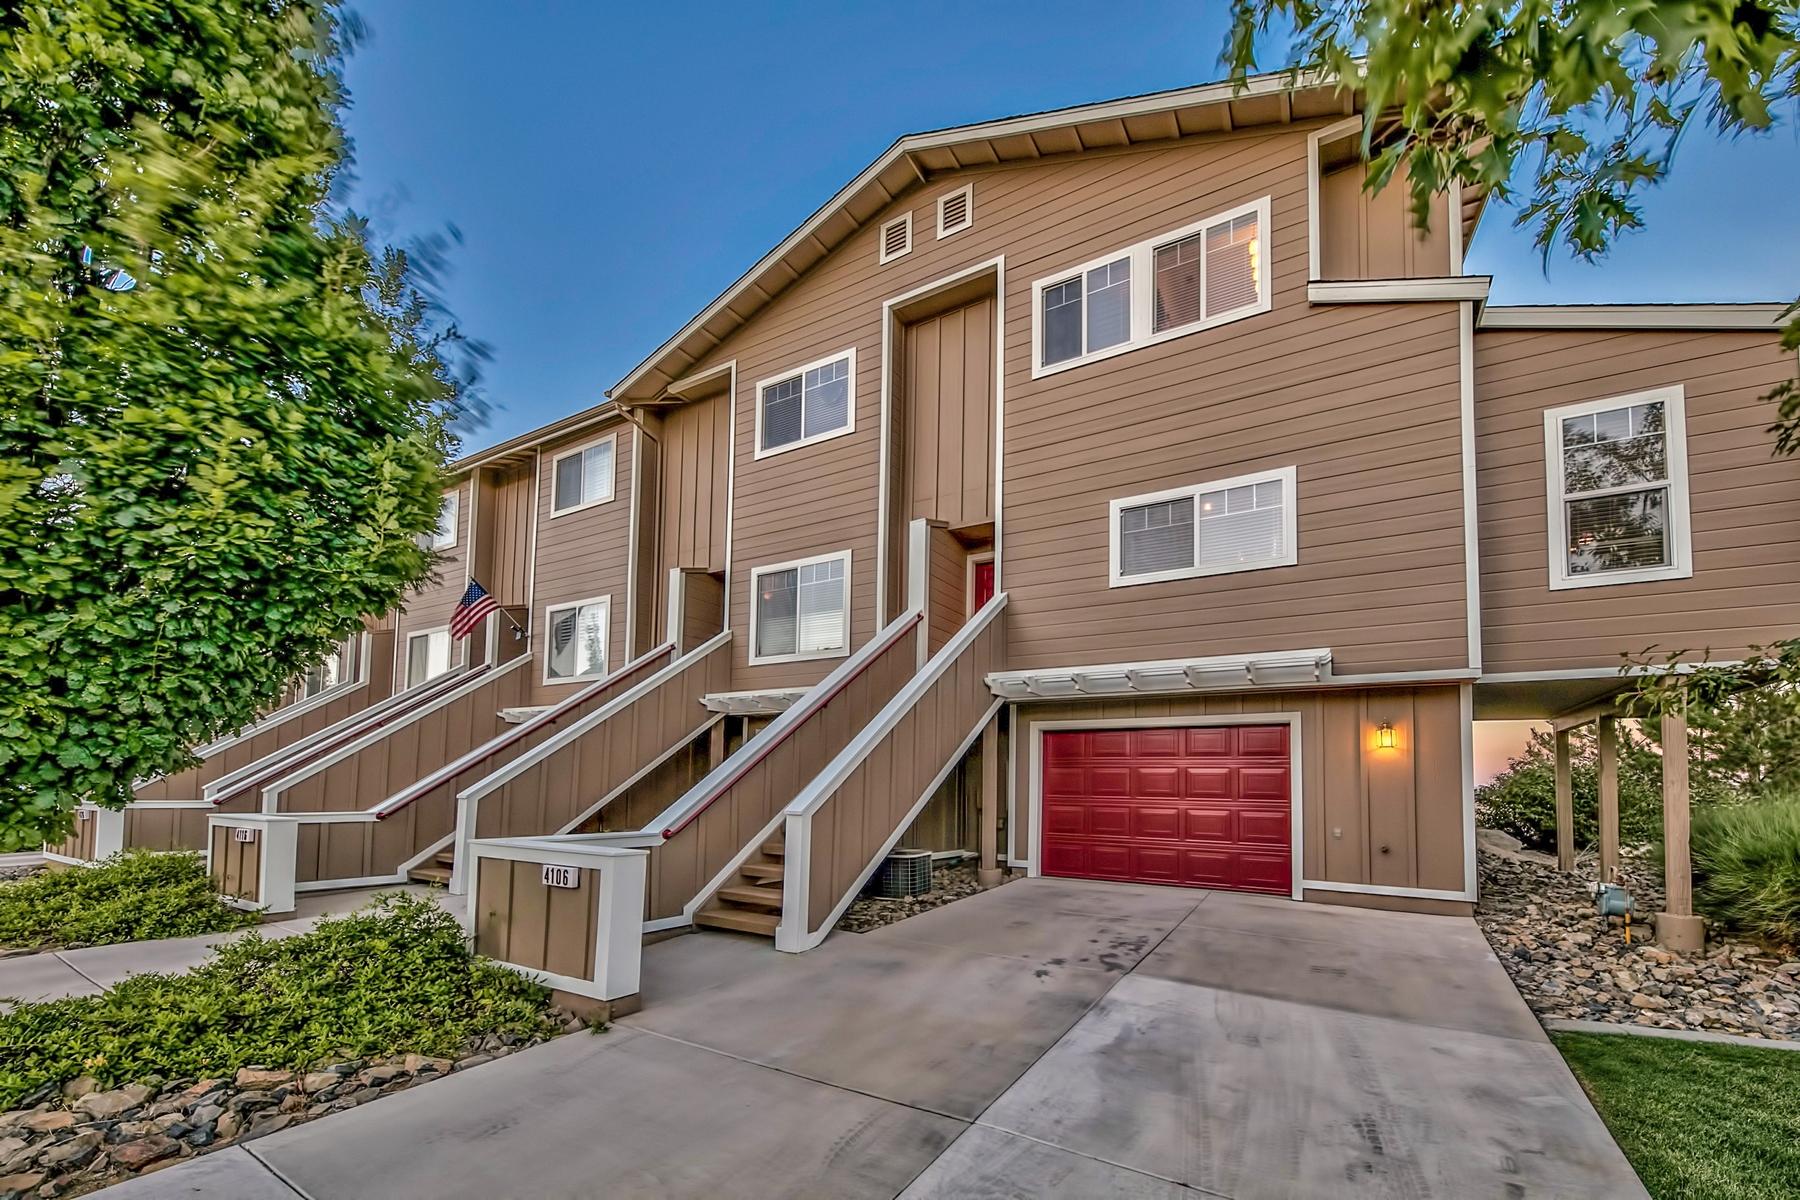 Property for Active at 4106 Kathleen Denise Lane, Reno, Nevada 4106 Kathleen Denise Lane Reno, Nevada 89503 United States